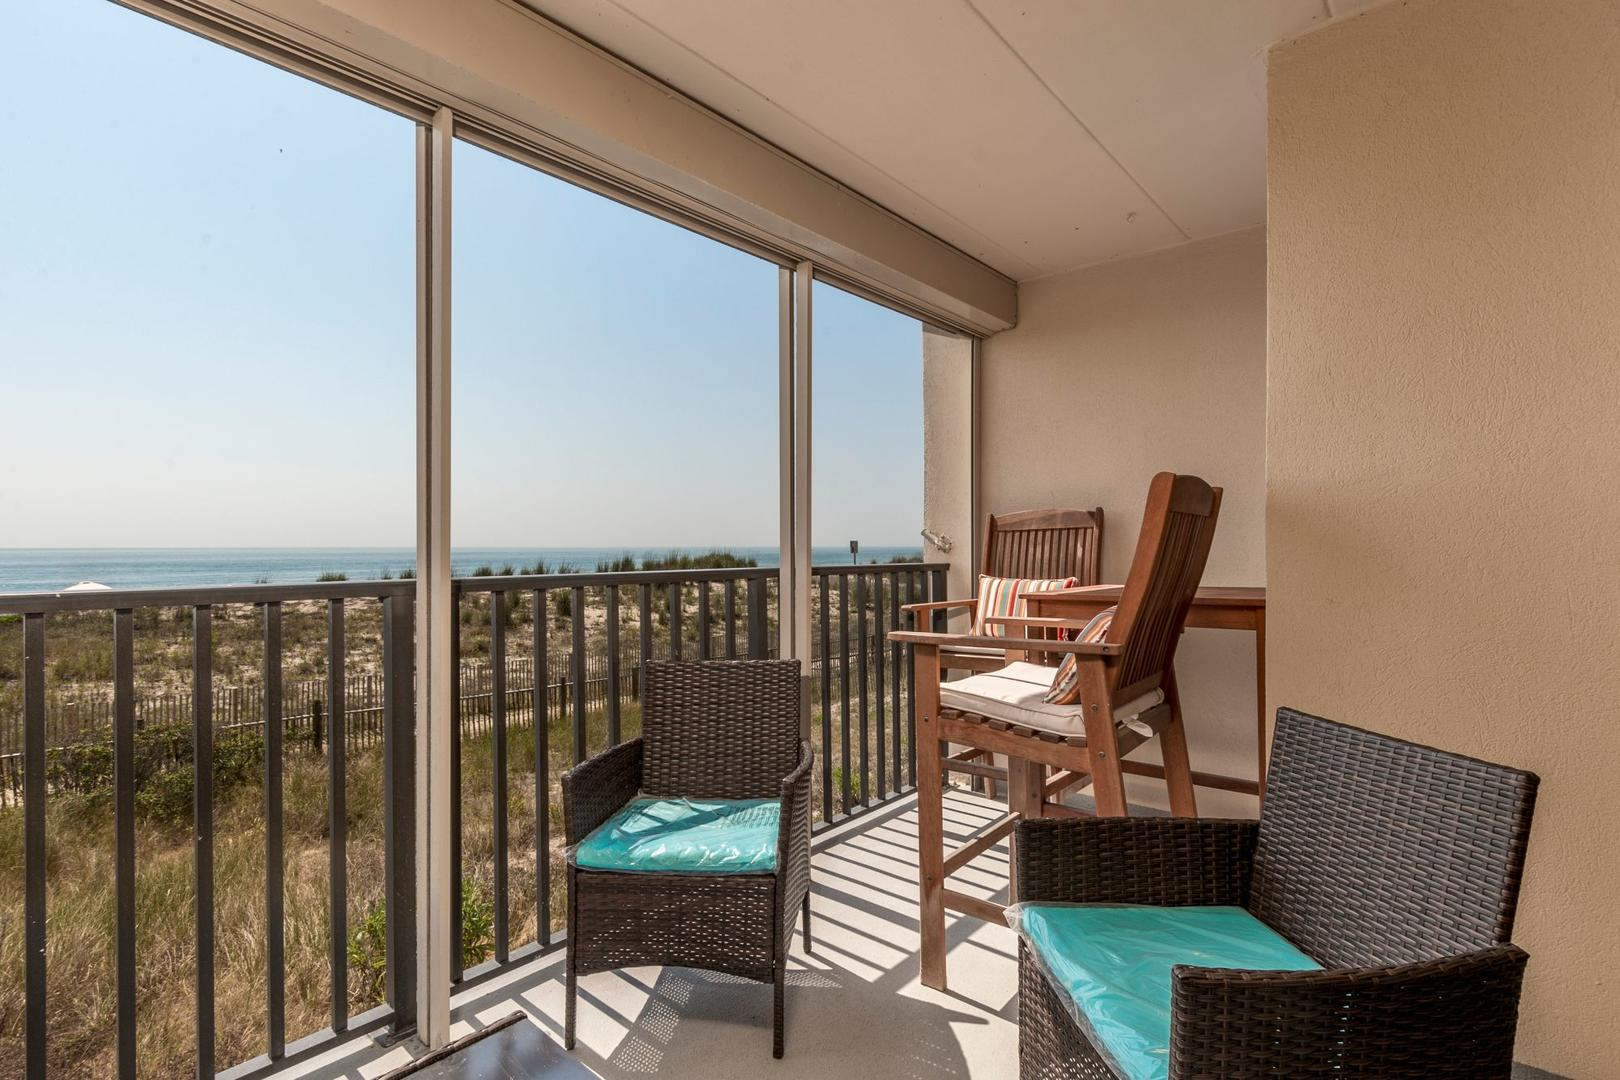 Amber Waves 101 - Oceanfront Balcony